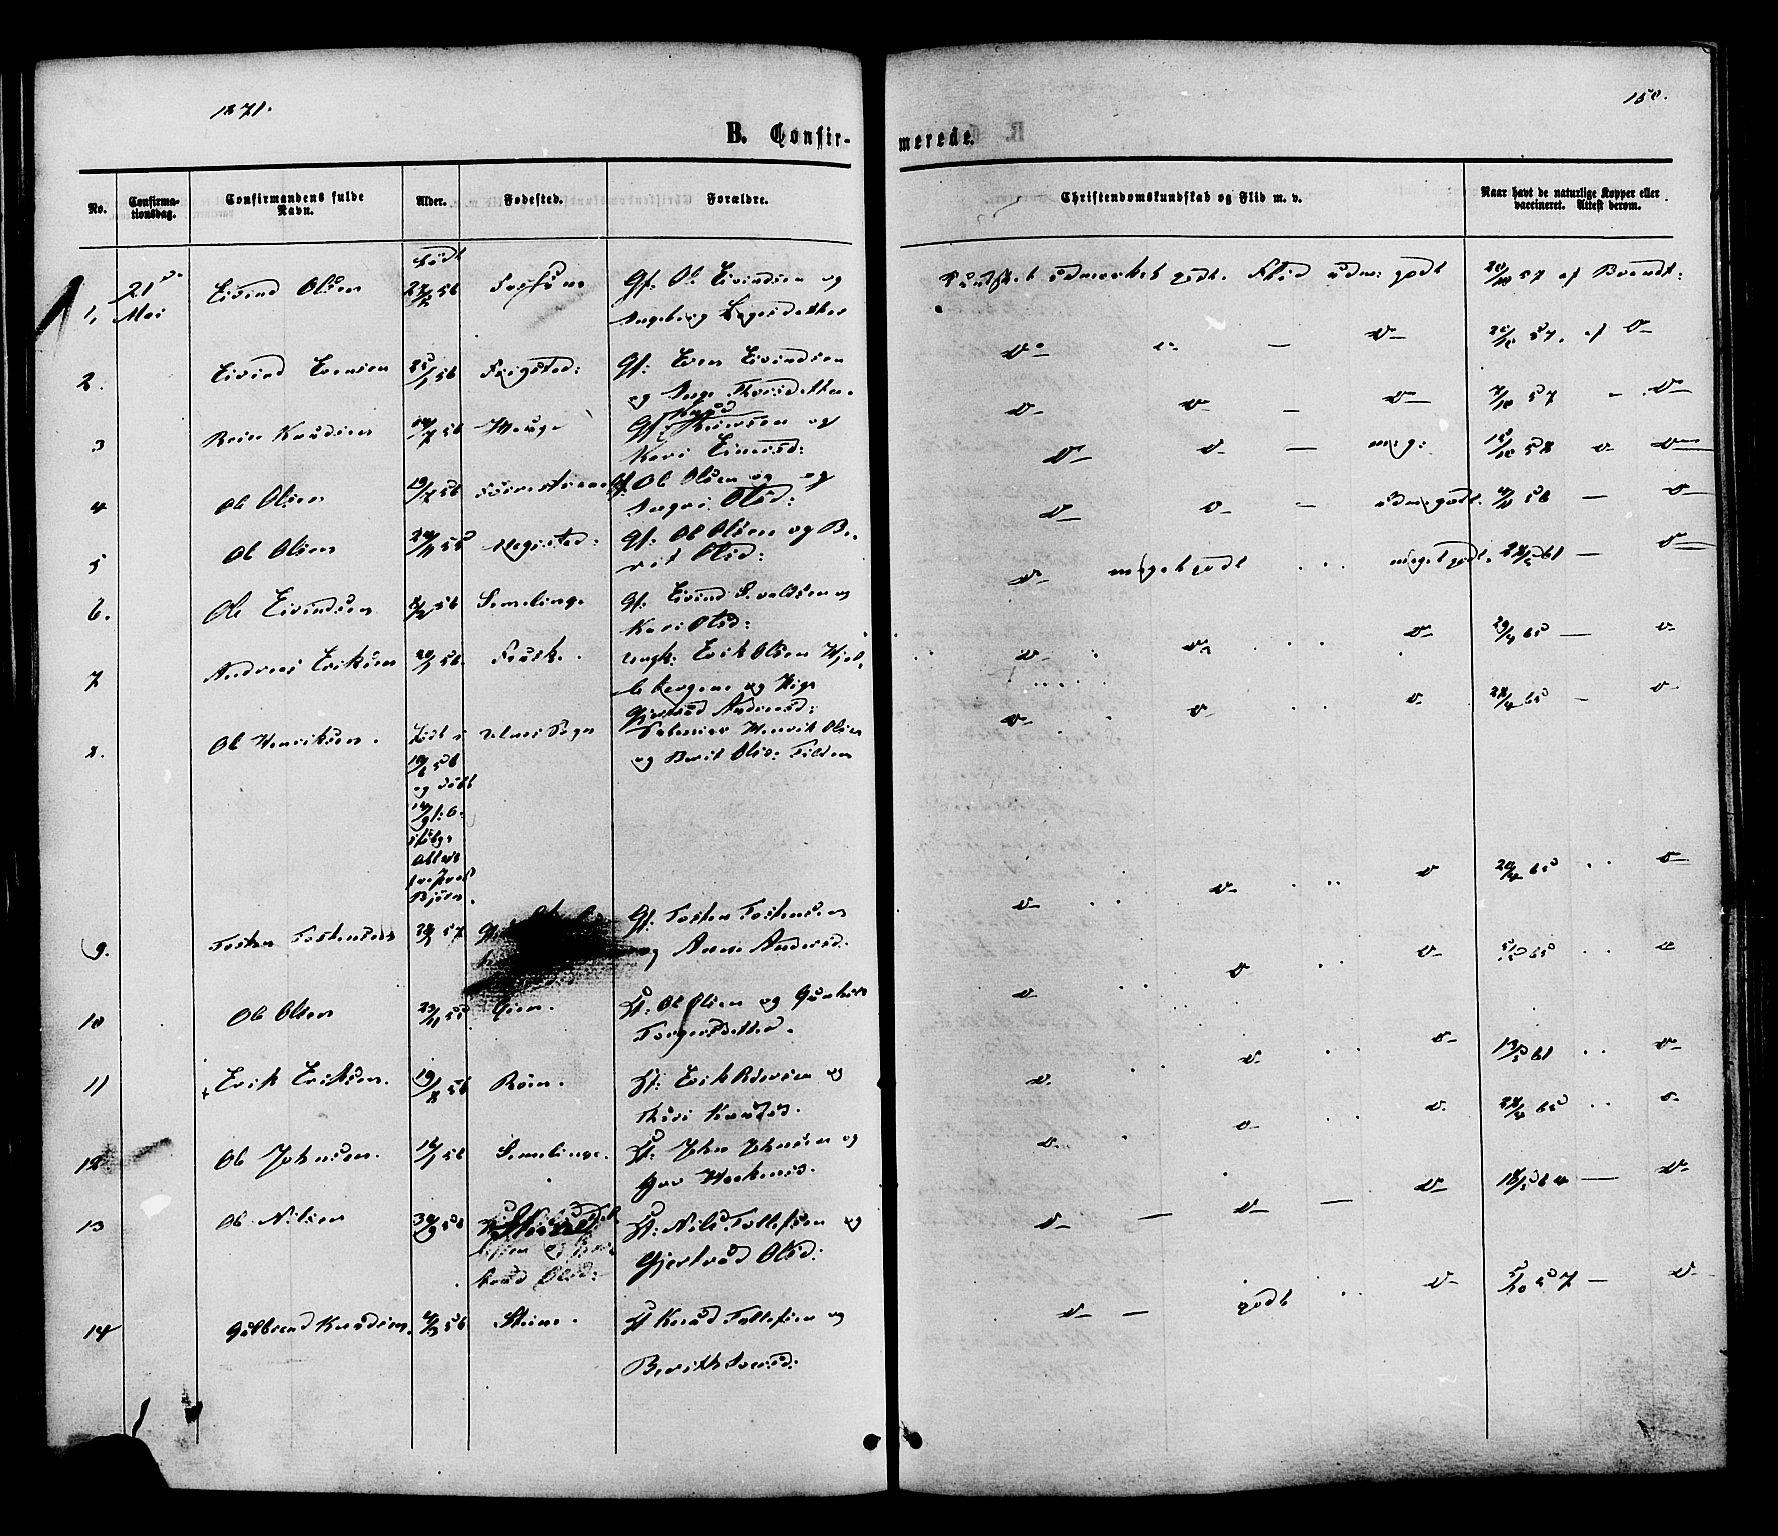 SAH, Vestre Slidre prestekontor, Ministerialbok nr. 3, 1865-1880, s. 150